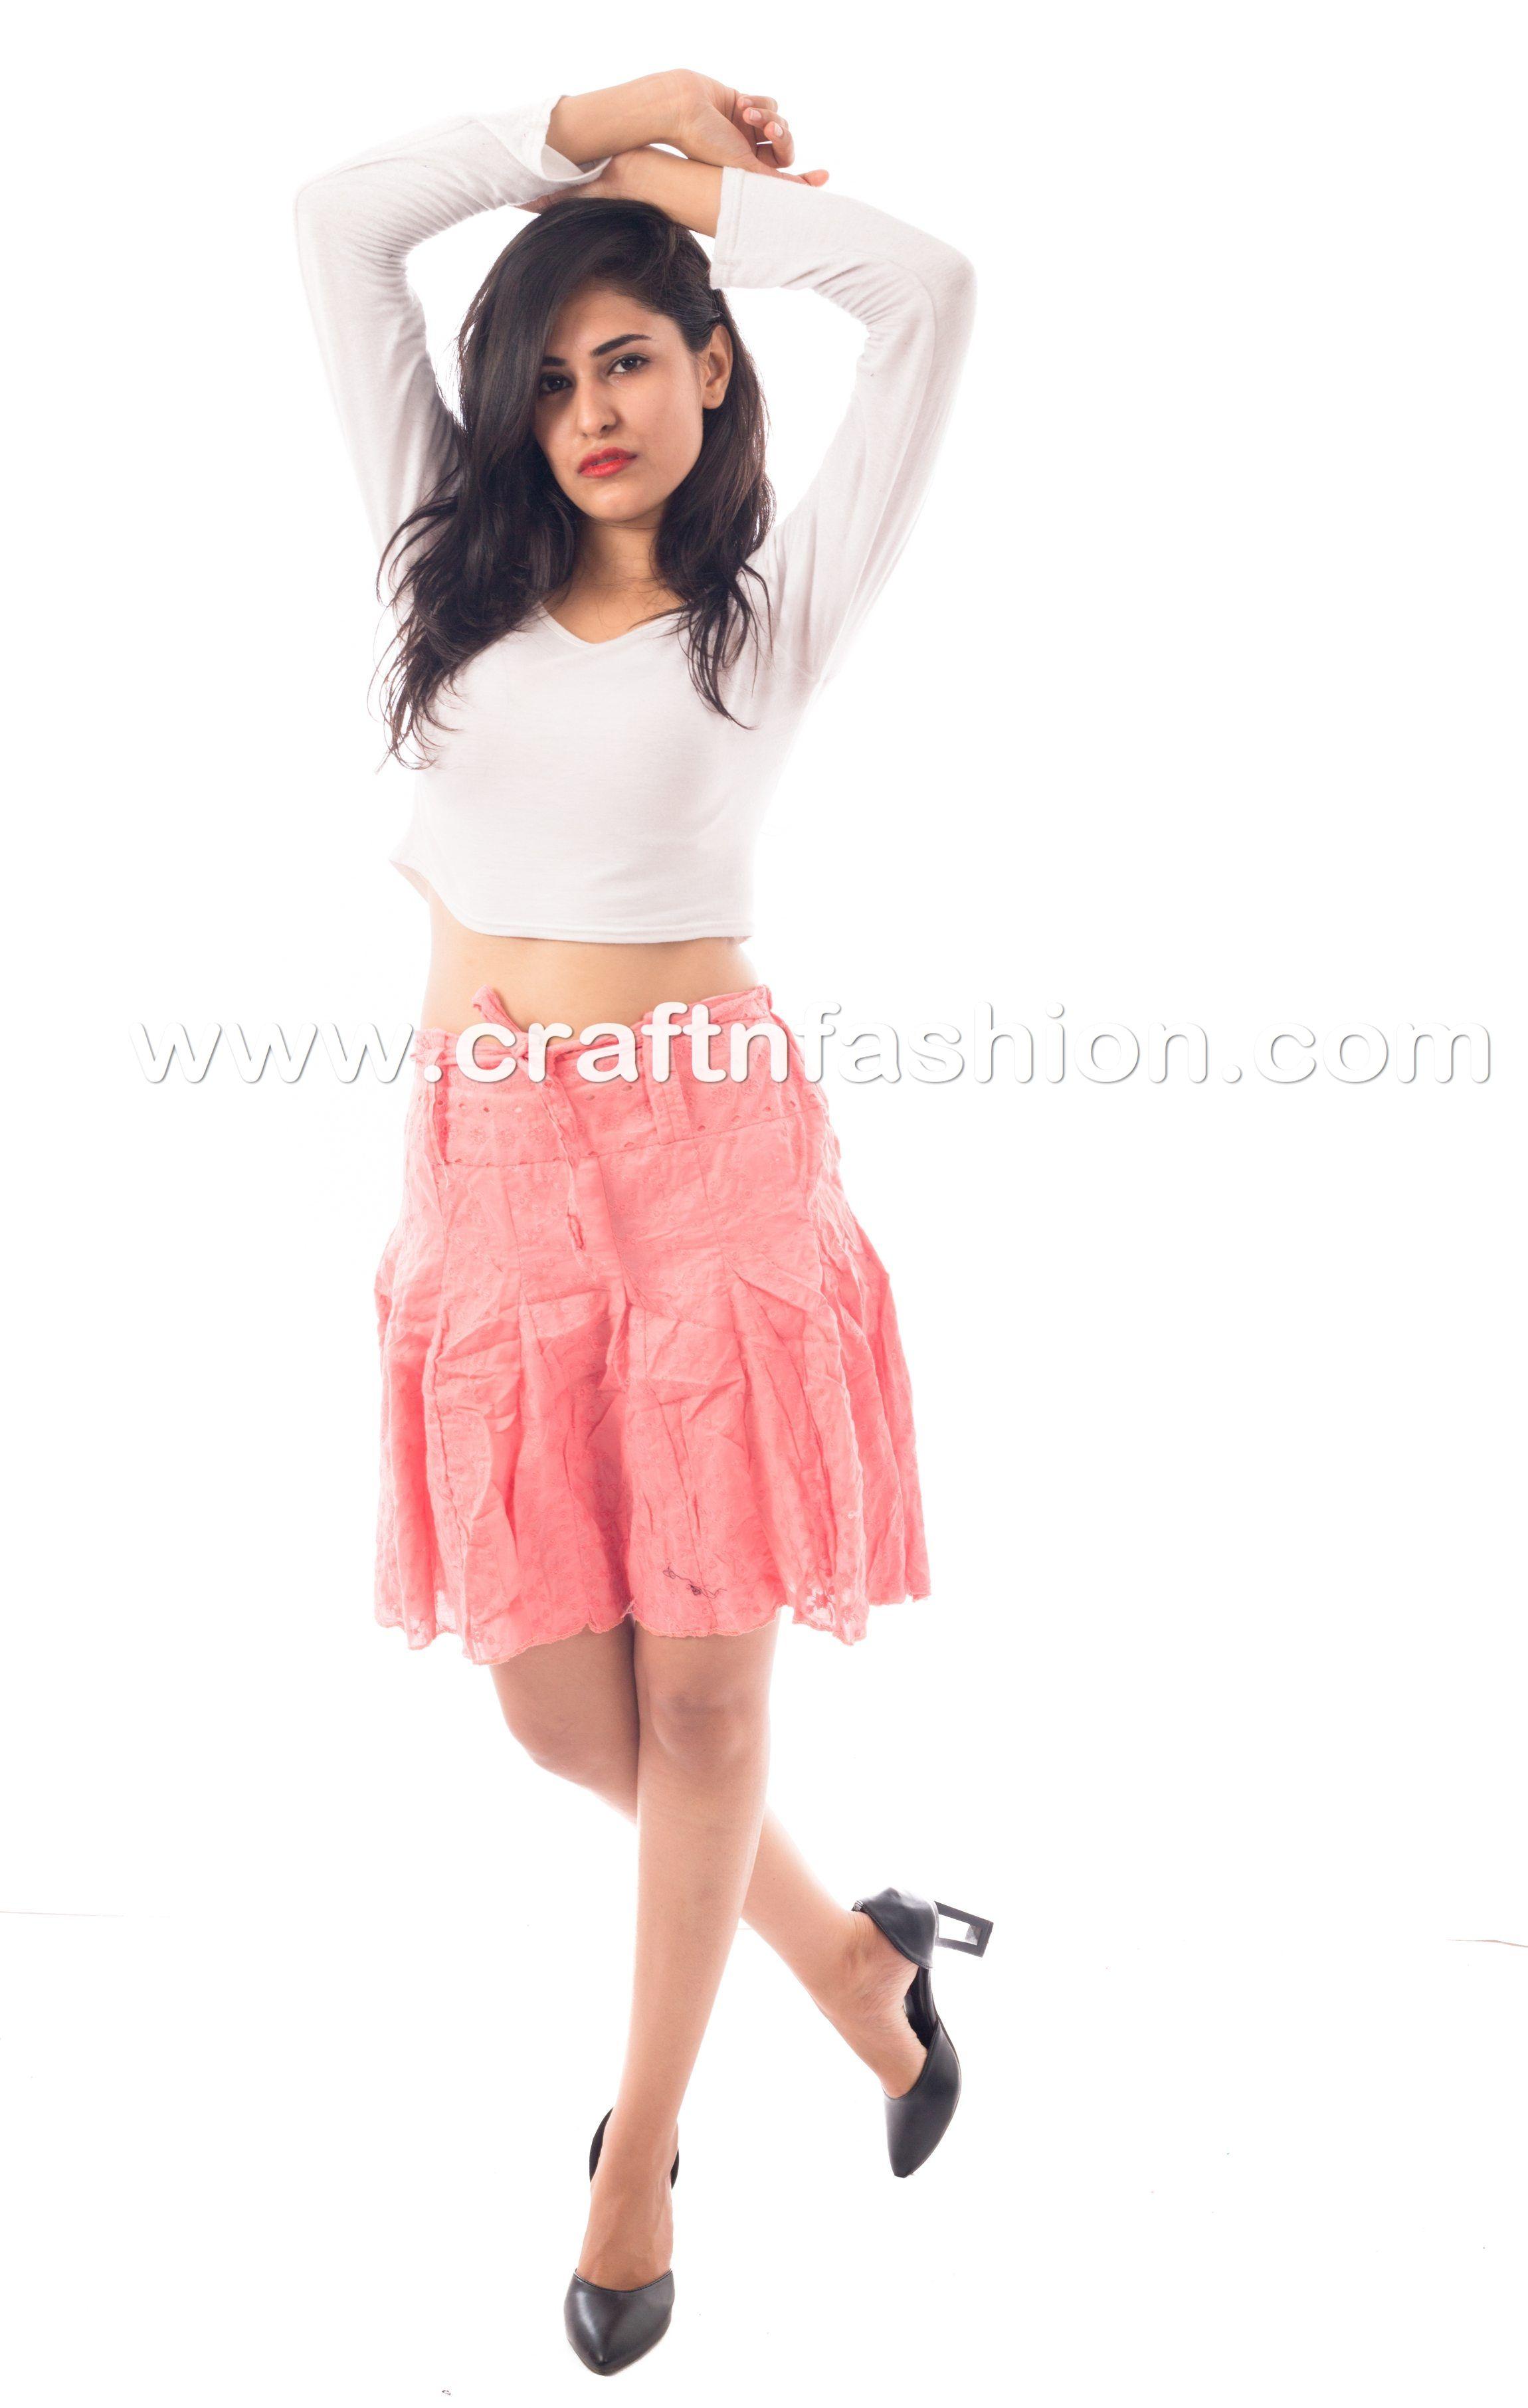 c9161faff74e Chikankari Cotton summer Wear Short Skirt - Girls' Mini Skirt  #Craftnfashion #LatestDesigner #FashionWearSkirt #CottonSkirt  #ChikankariSkirt #HakobaSkirt ...